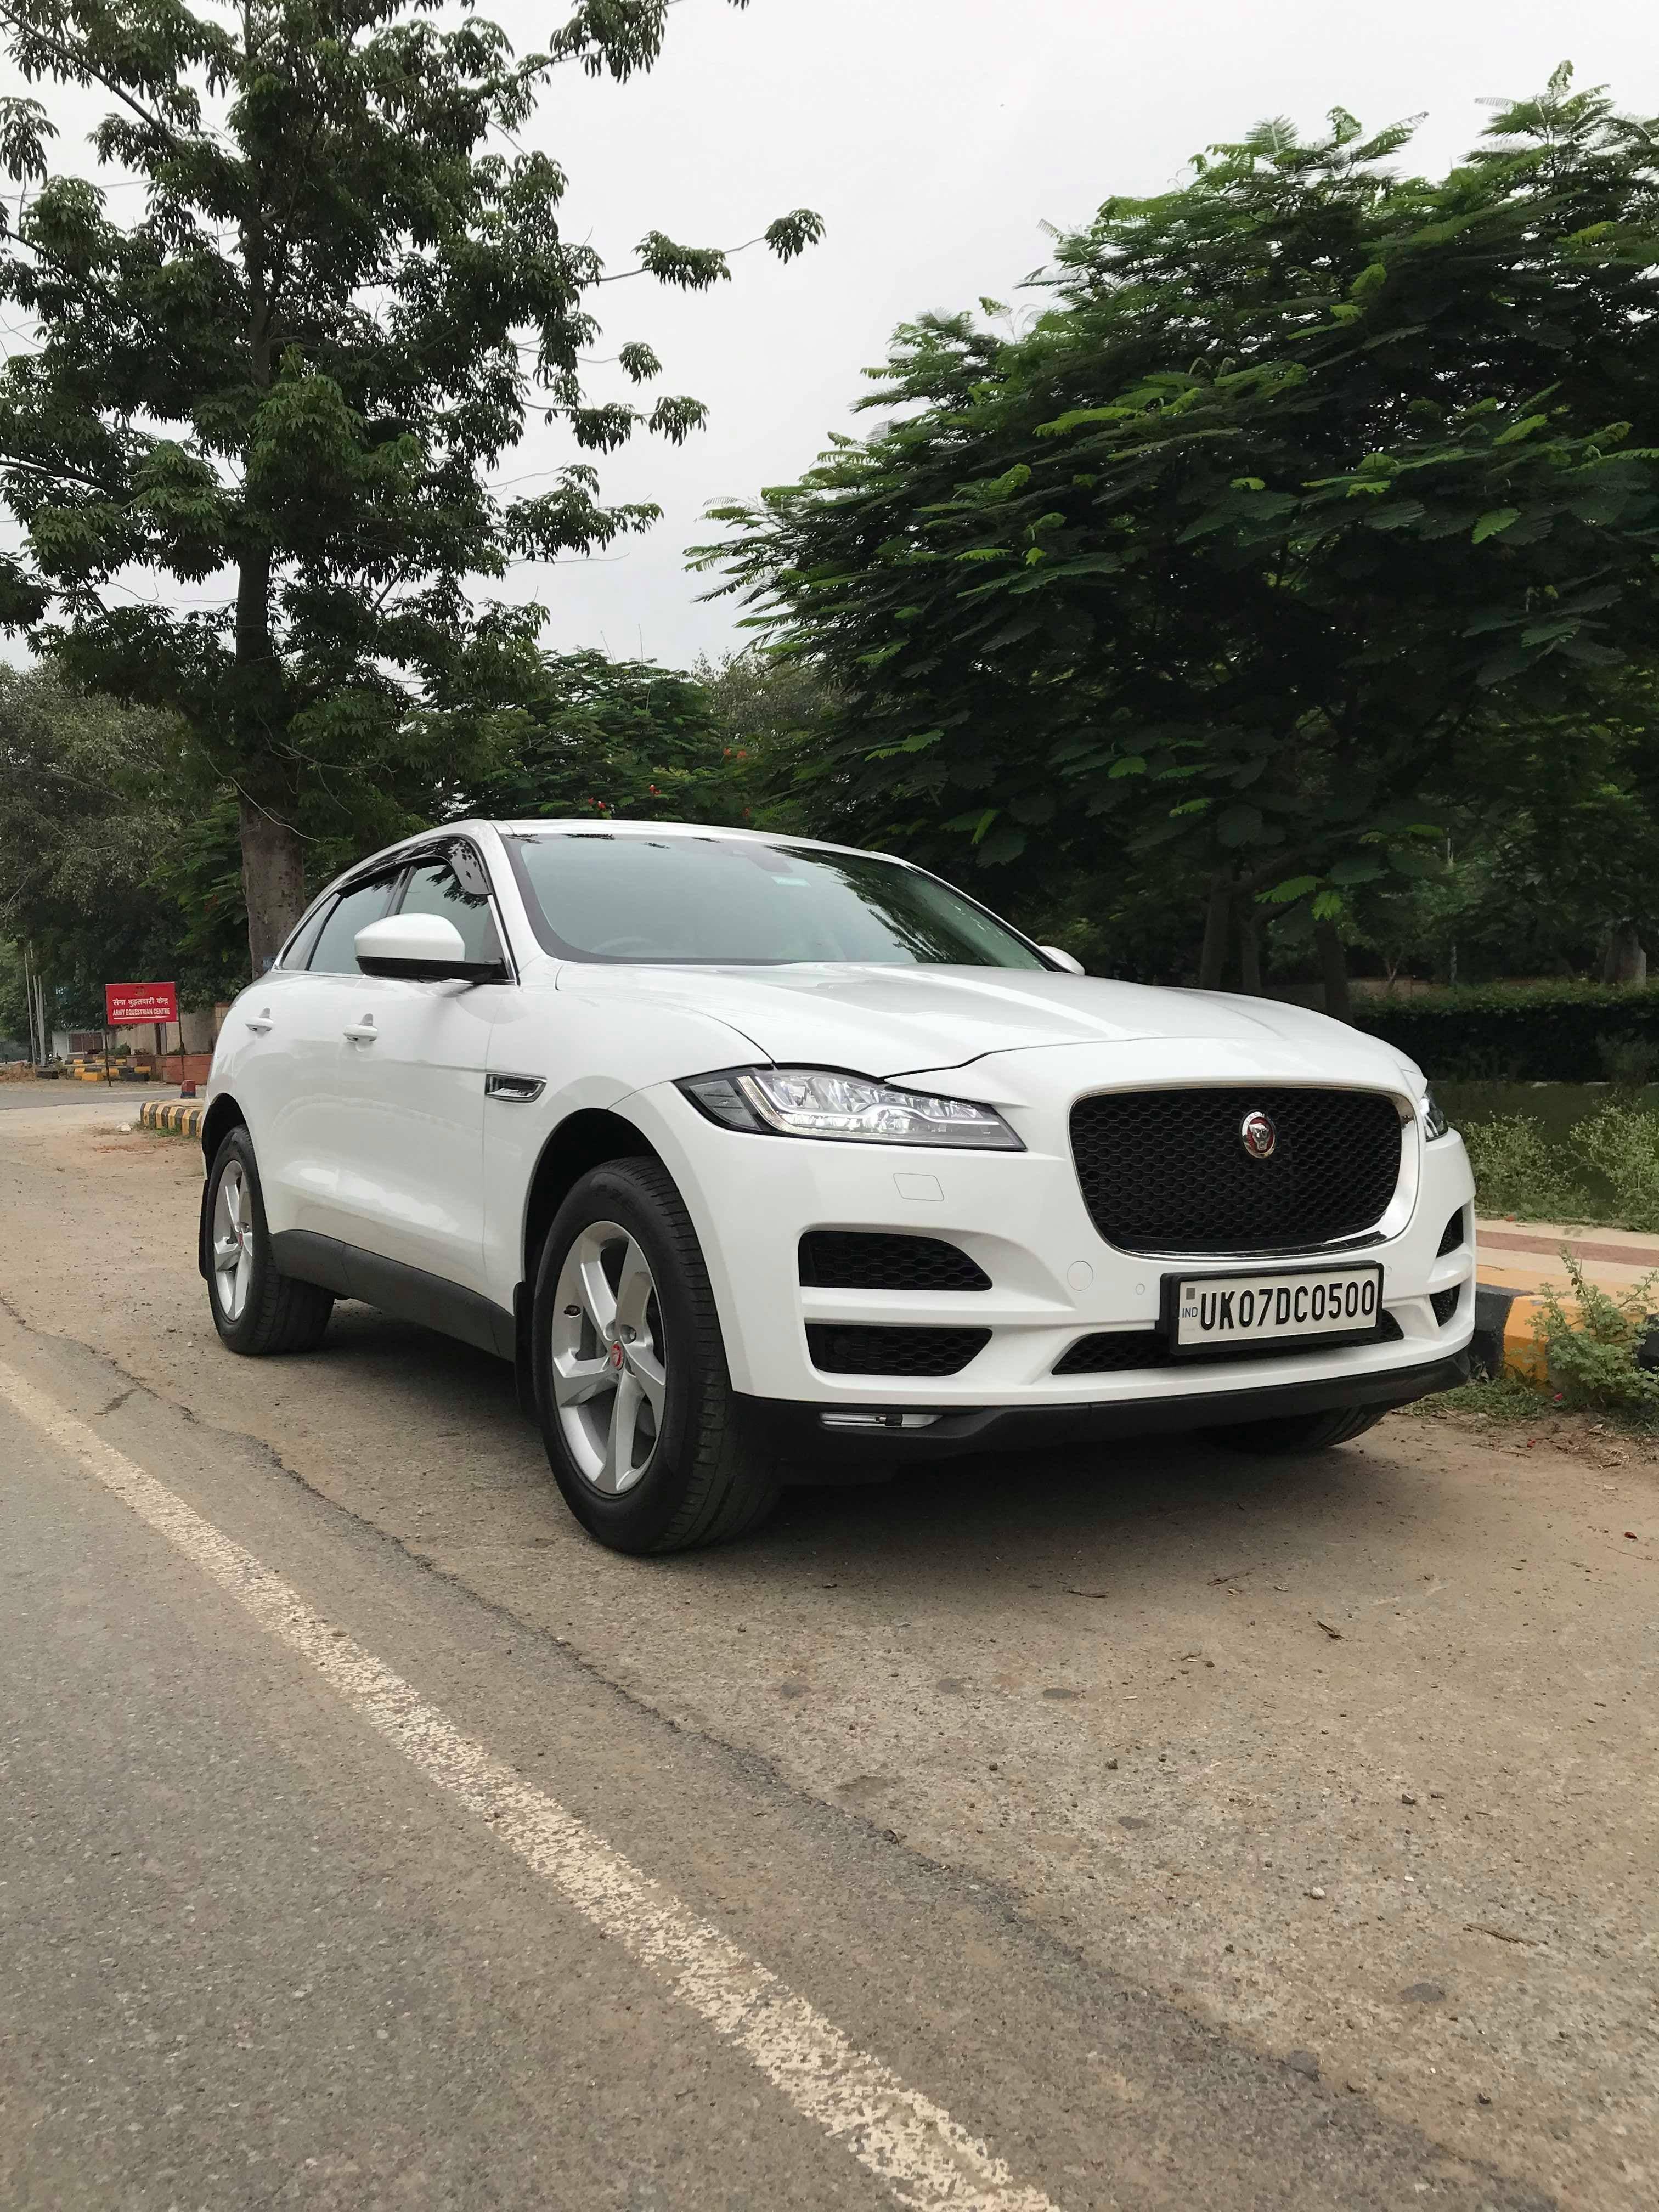 Jaguar F Pace 20d Awd Prestige 2019 Real Life Review Luxury Crossovers Jaguar Car Awd